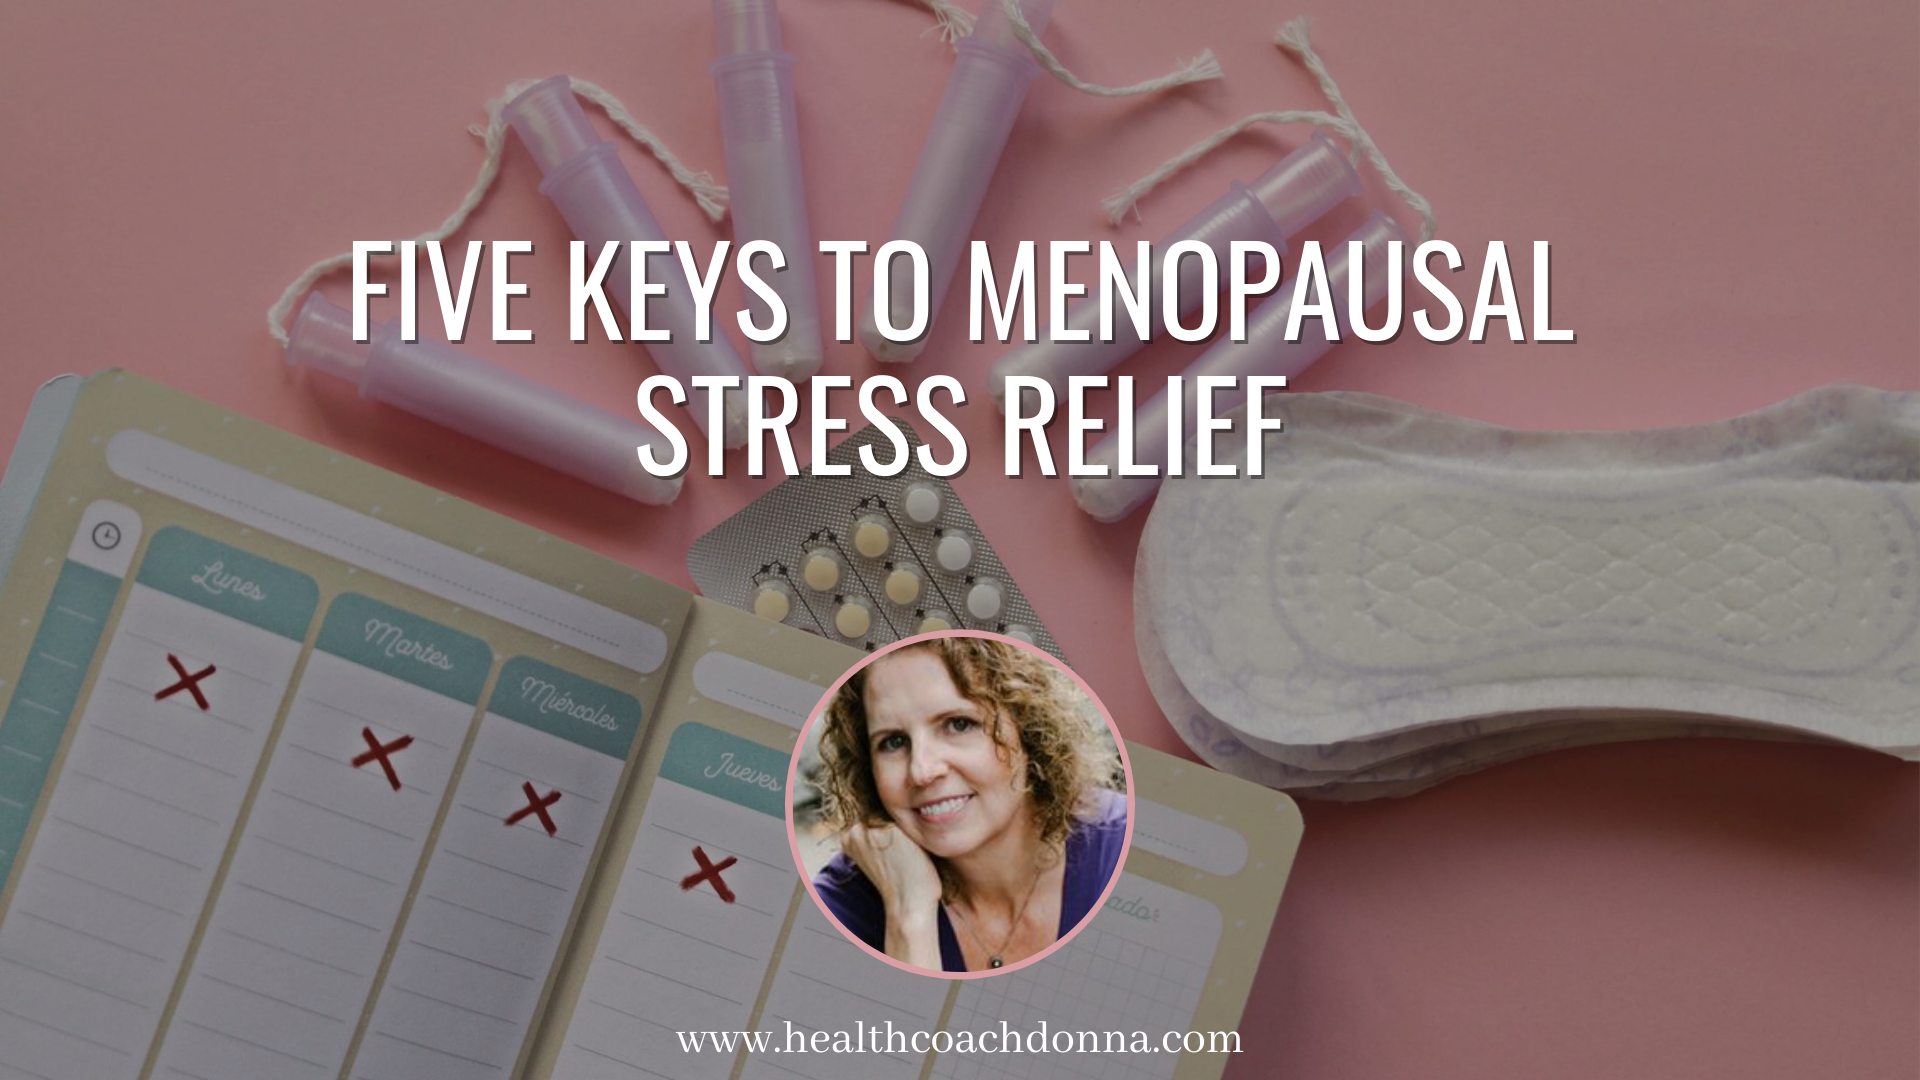 Five Keys to Menopausal Stress Relief